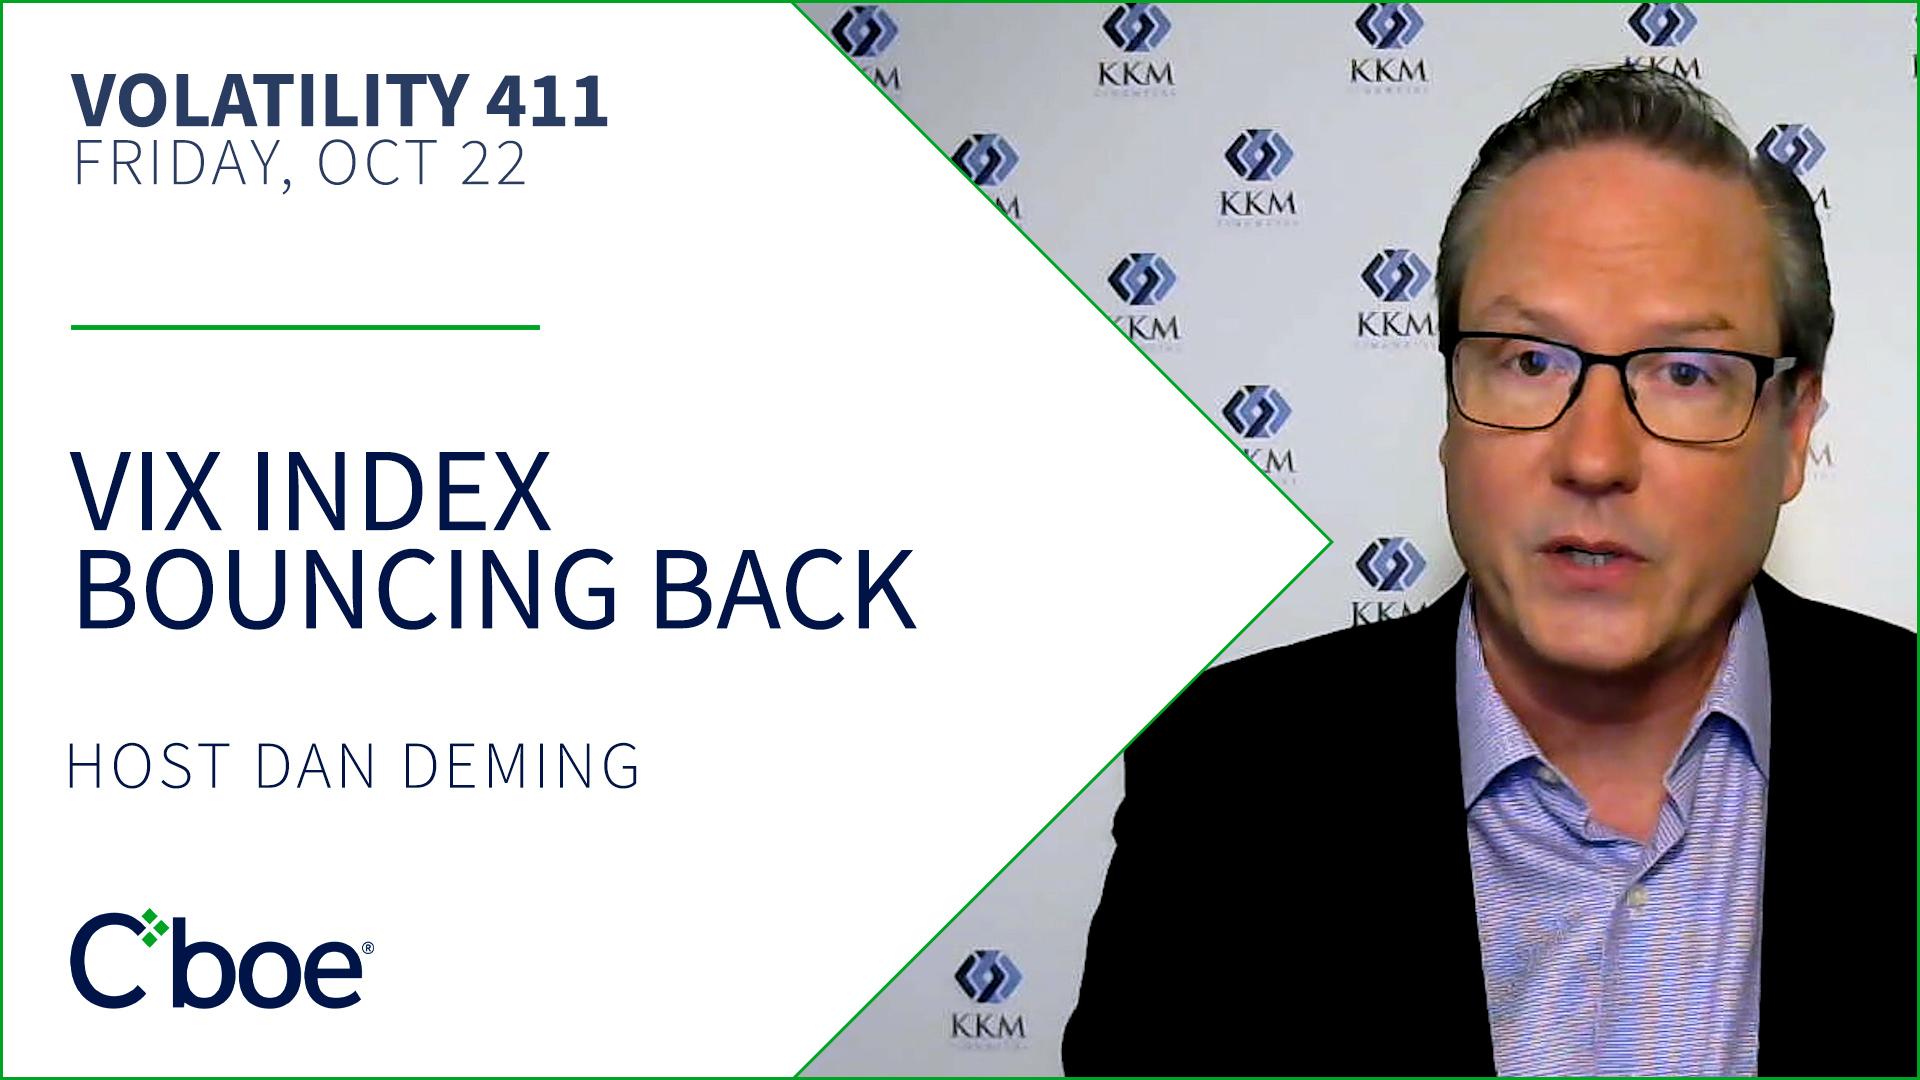 VIX Index Bouncing Back Thumbnail